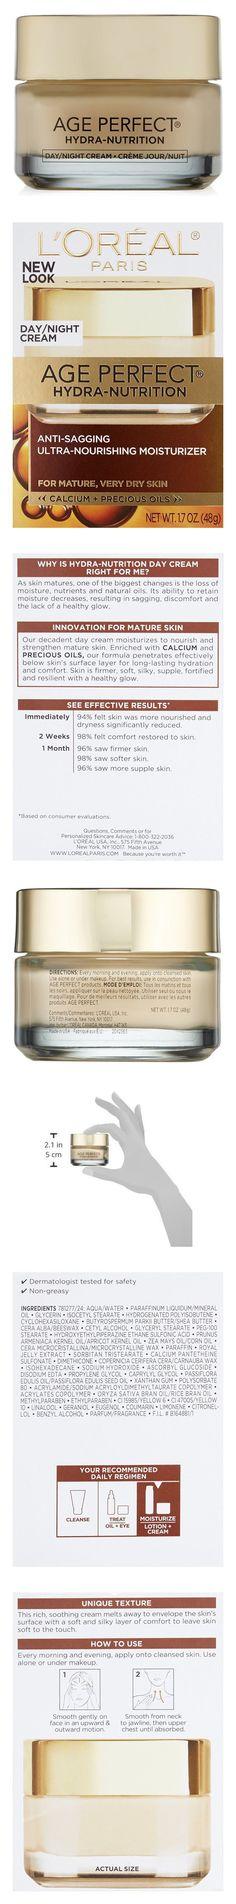 L'Oreal Paris Age Perfect Hydra-Nutrition Facial Day/Night Cream 1.7 FL OZ #beauty #lorealparis